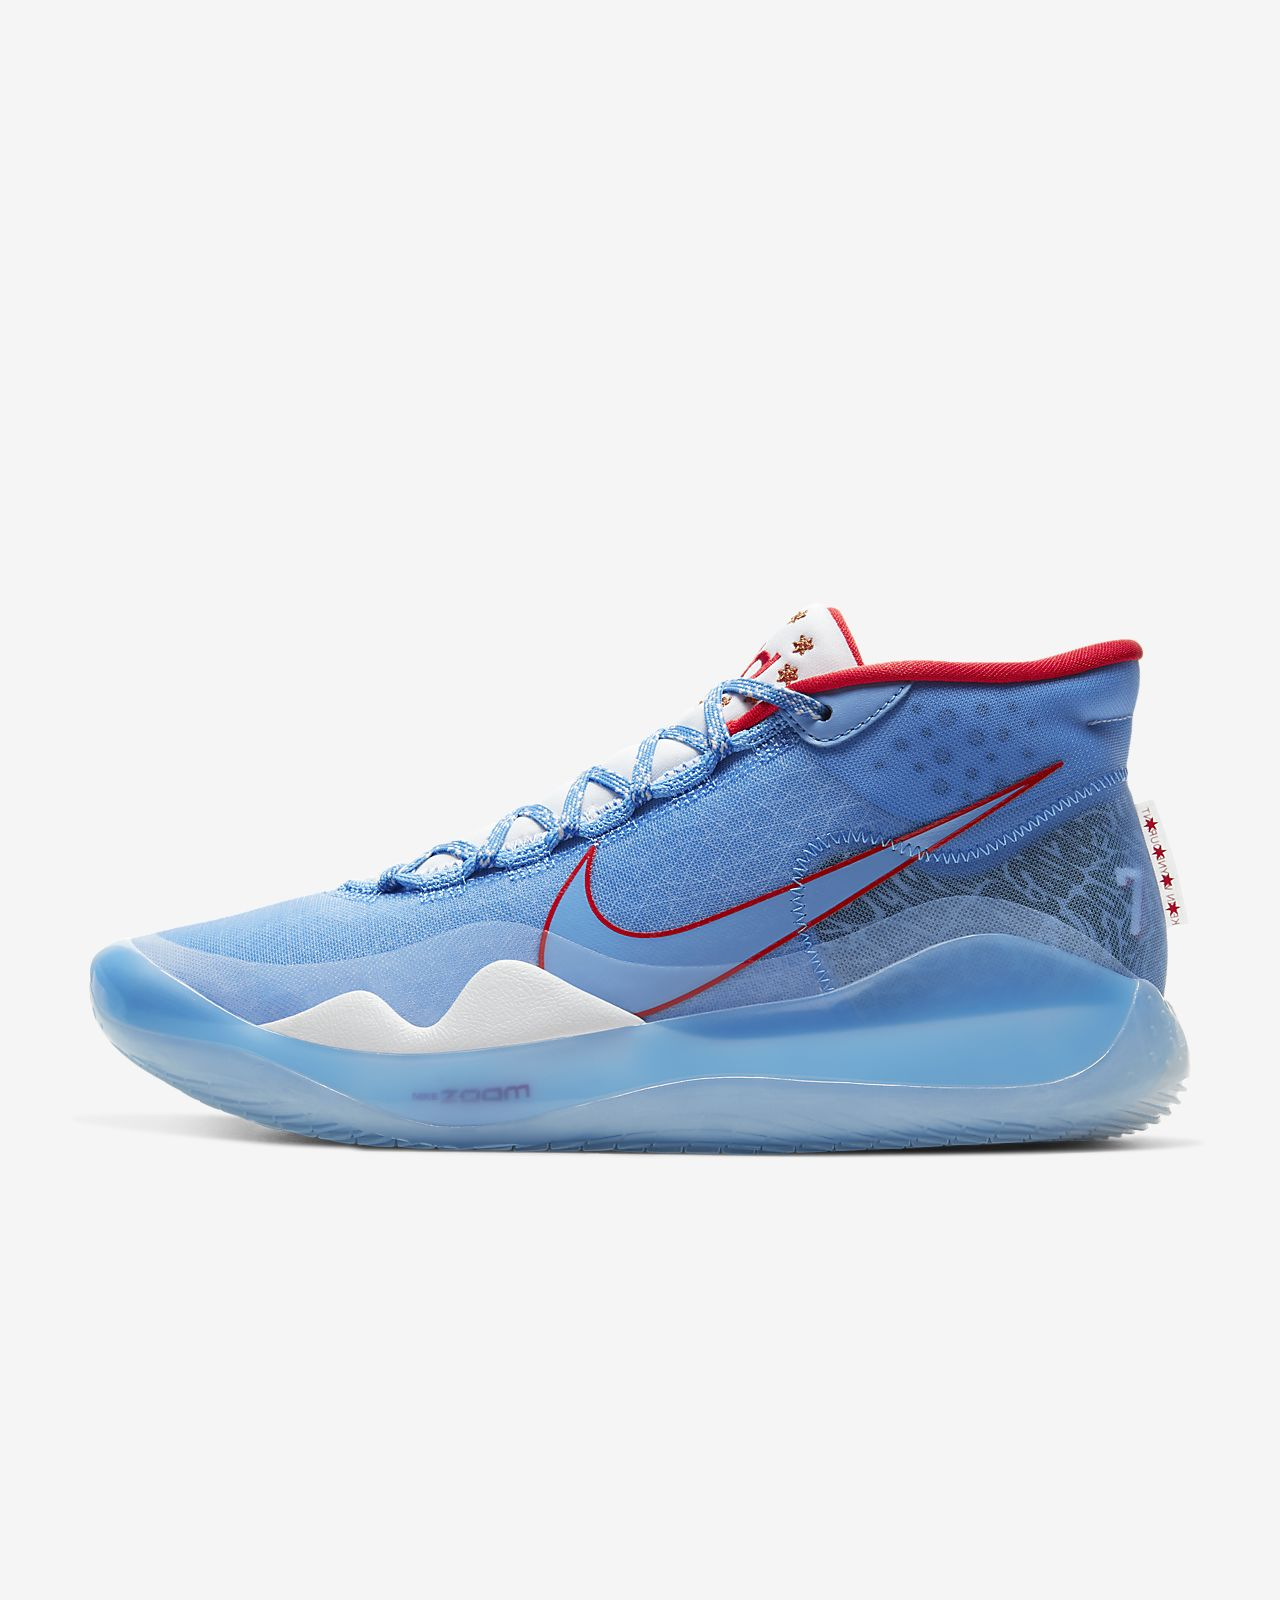 Nike Zoom KD12 Don C Basketballschuh